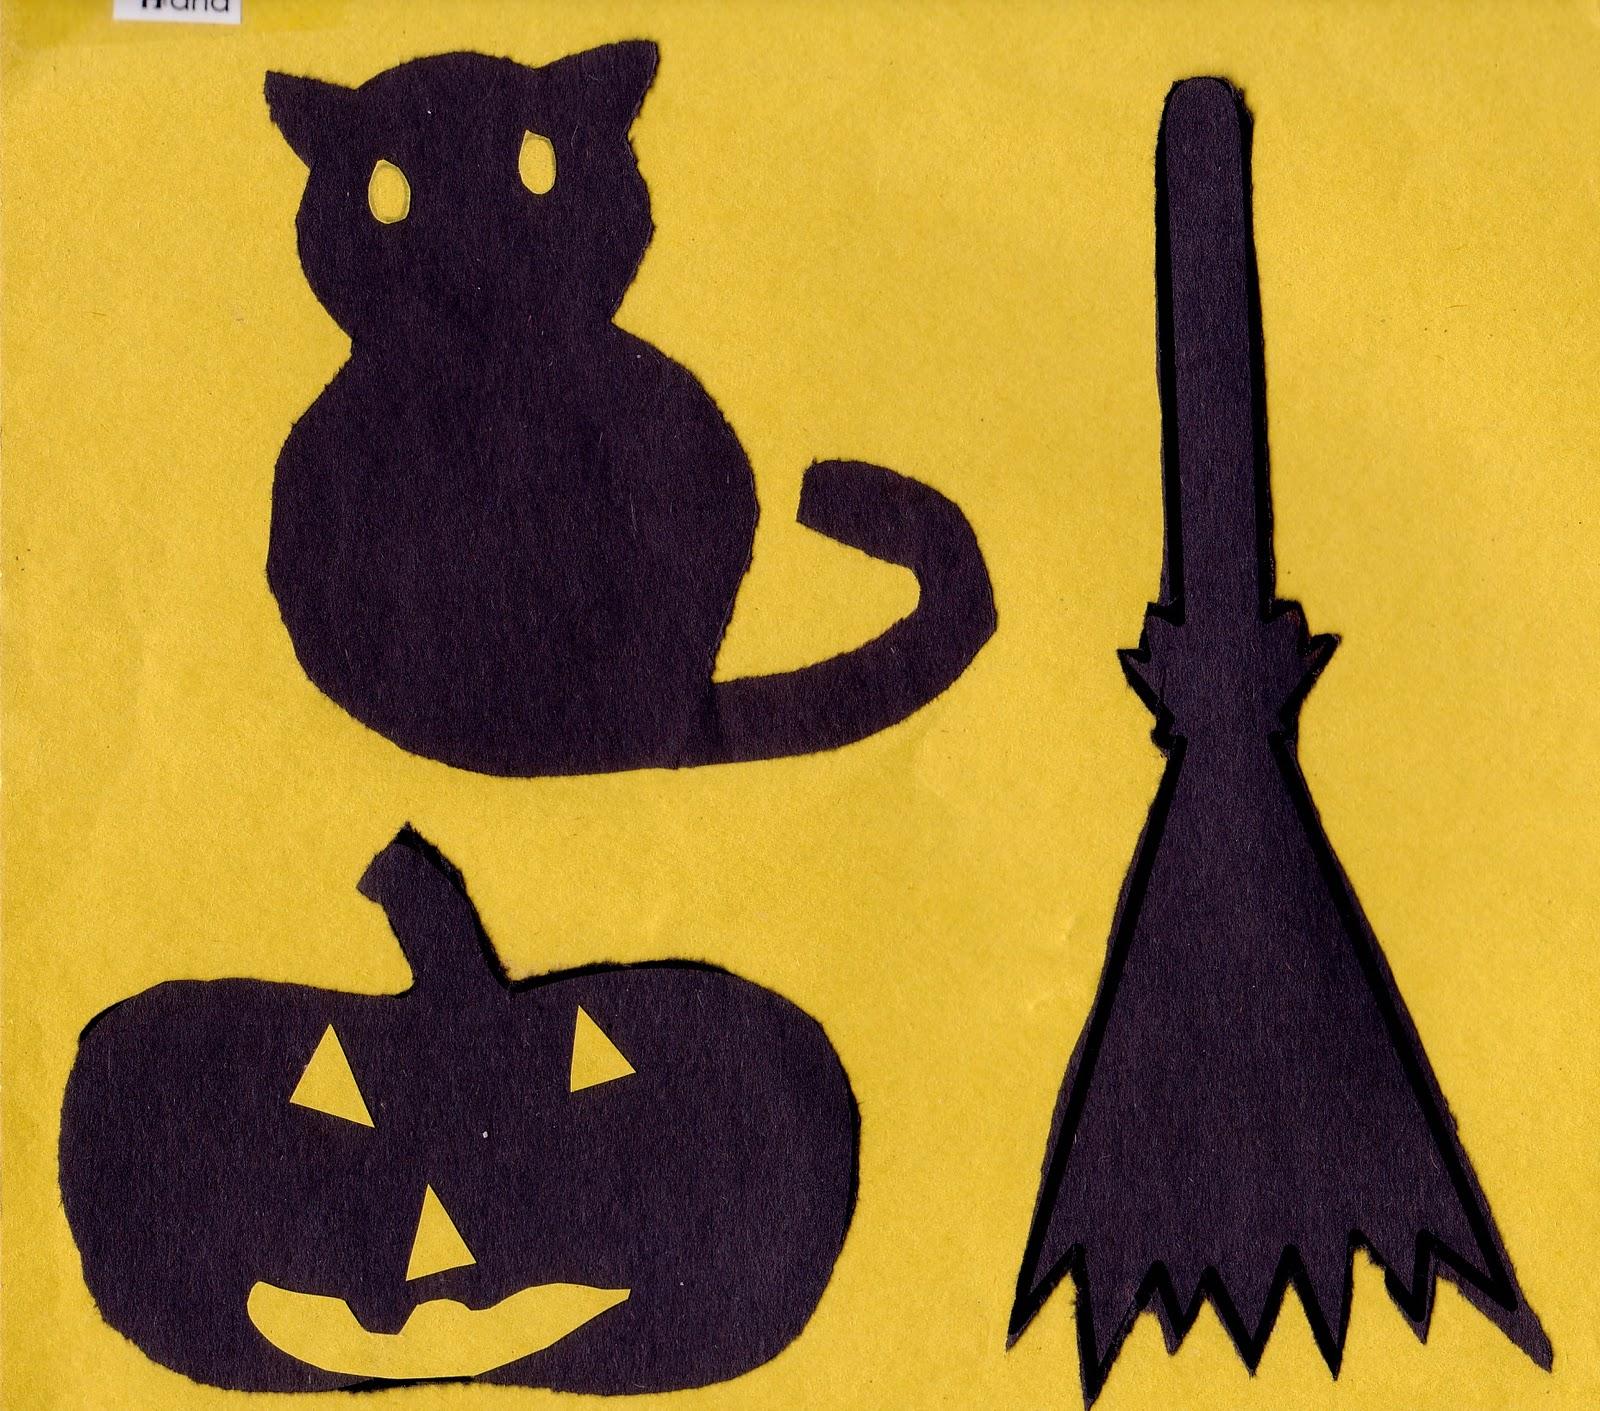 Preschool Crafts For Kids Easy Hallowen Banner Craft For